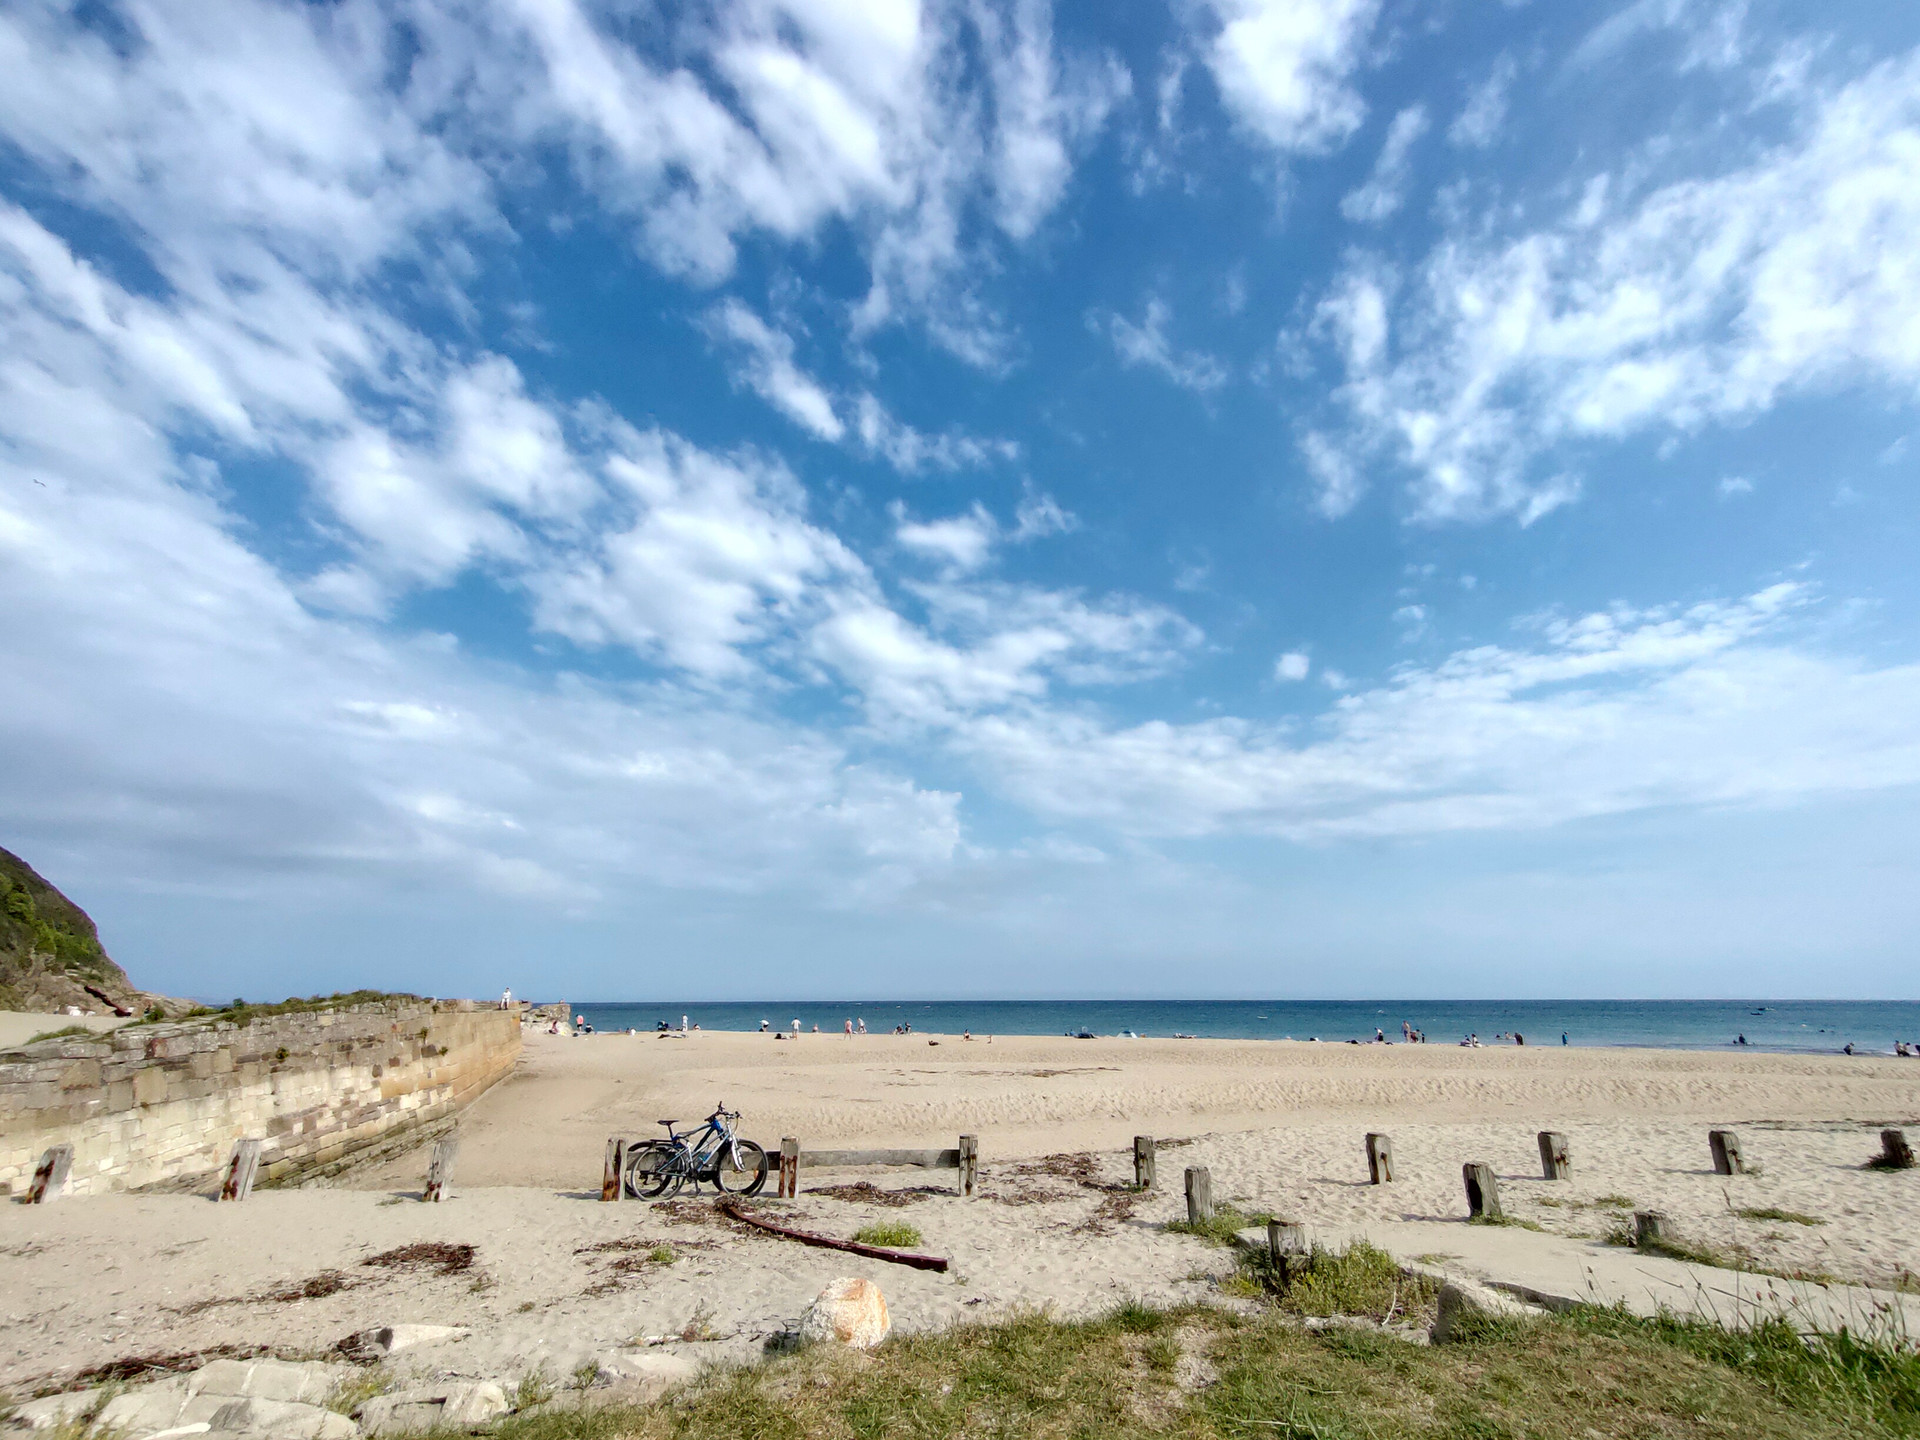 Realme 5 Pro Wide angle HDR beach